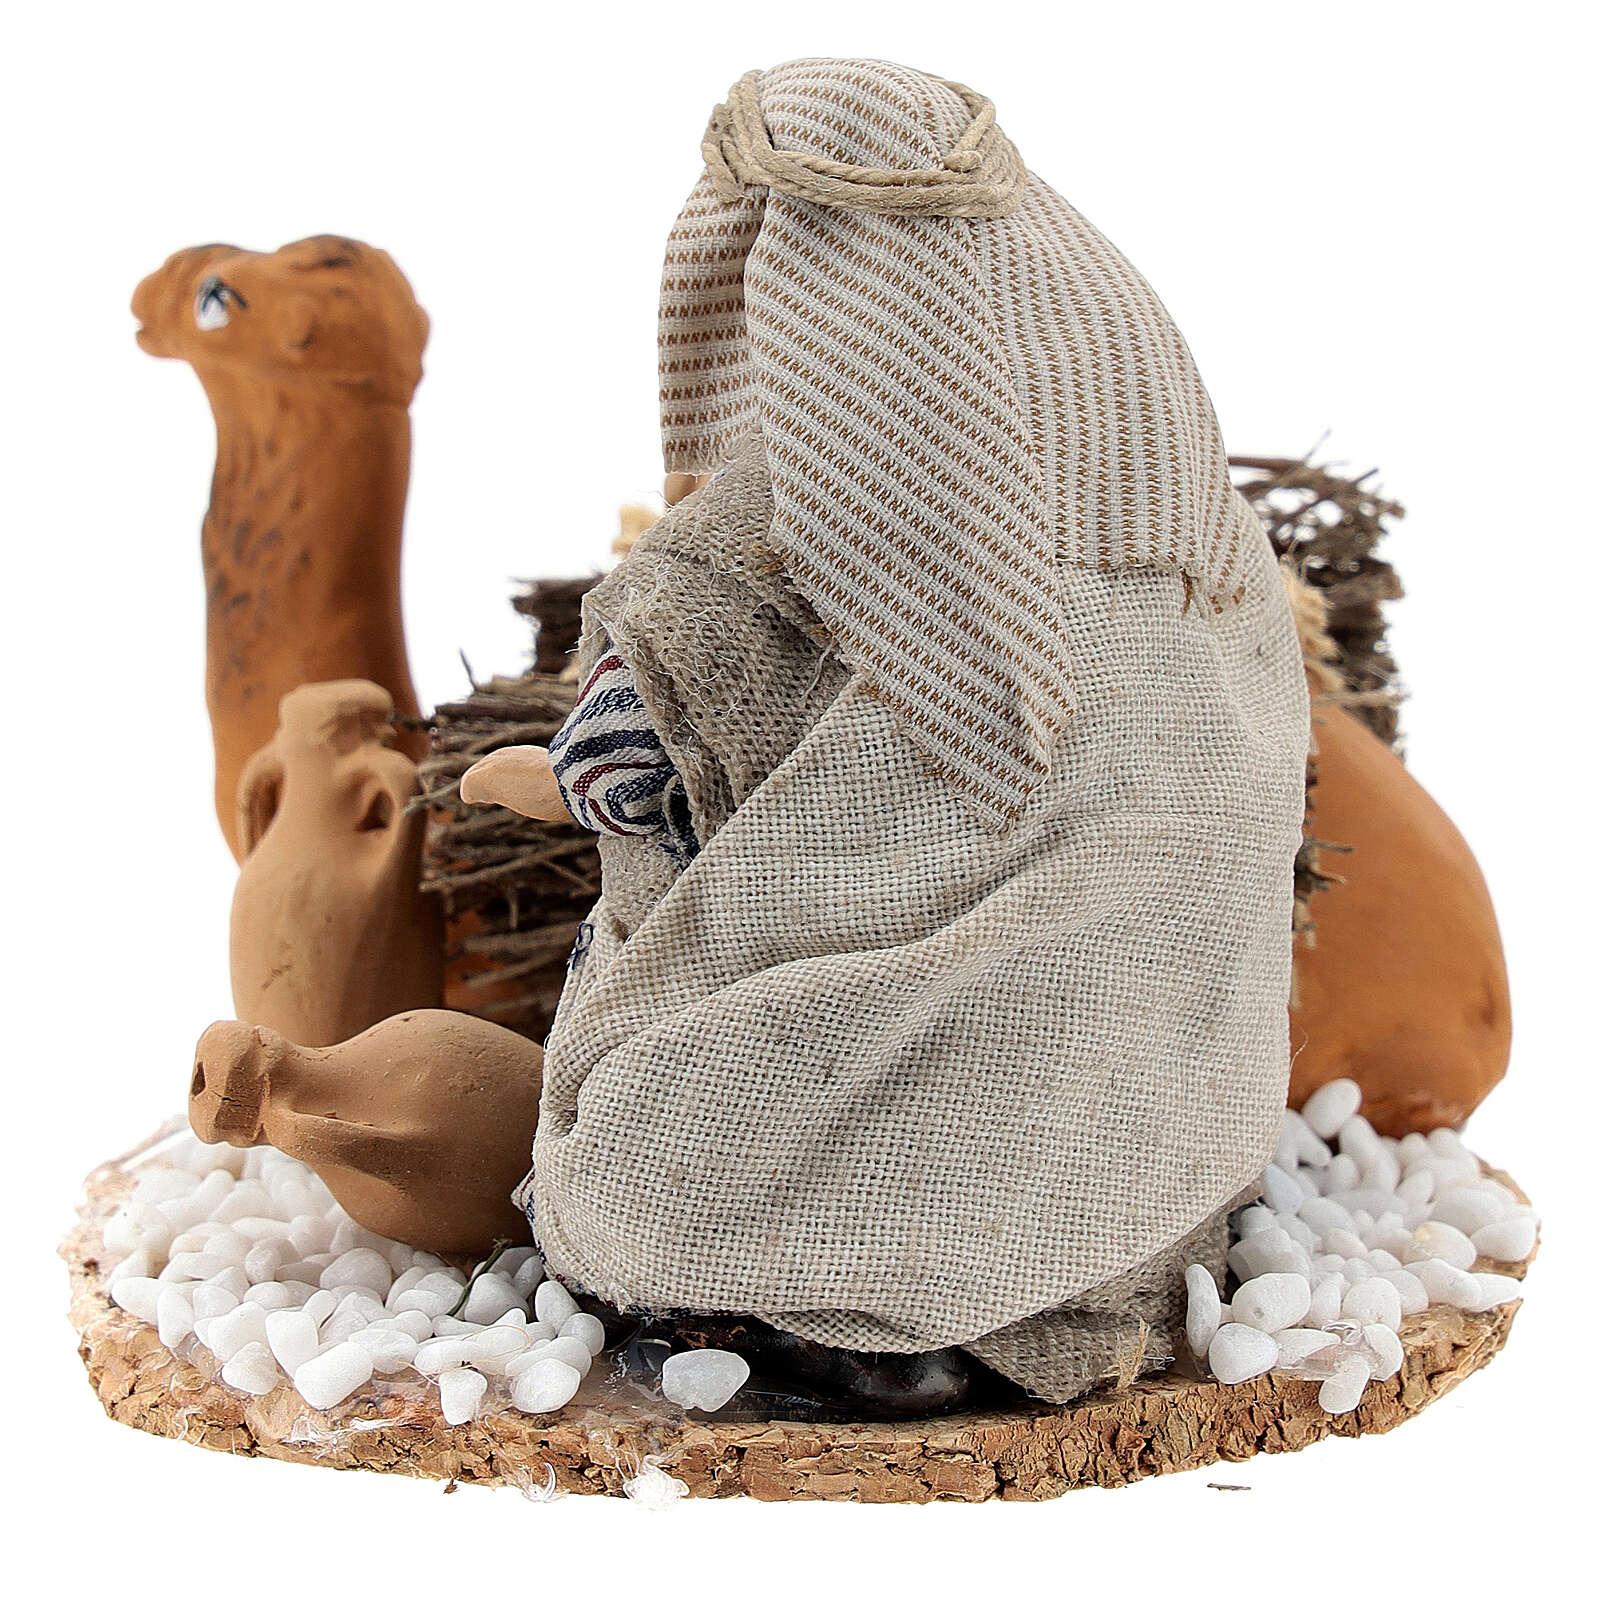 Man loading camel with vases, 8 cm Neapolitan nativity terracotta 4